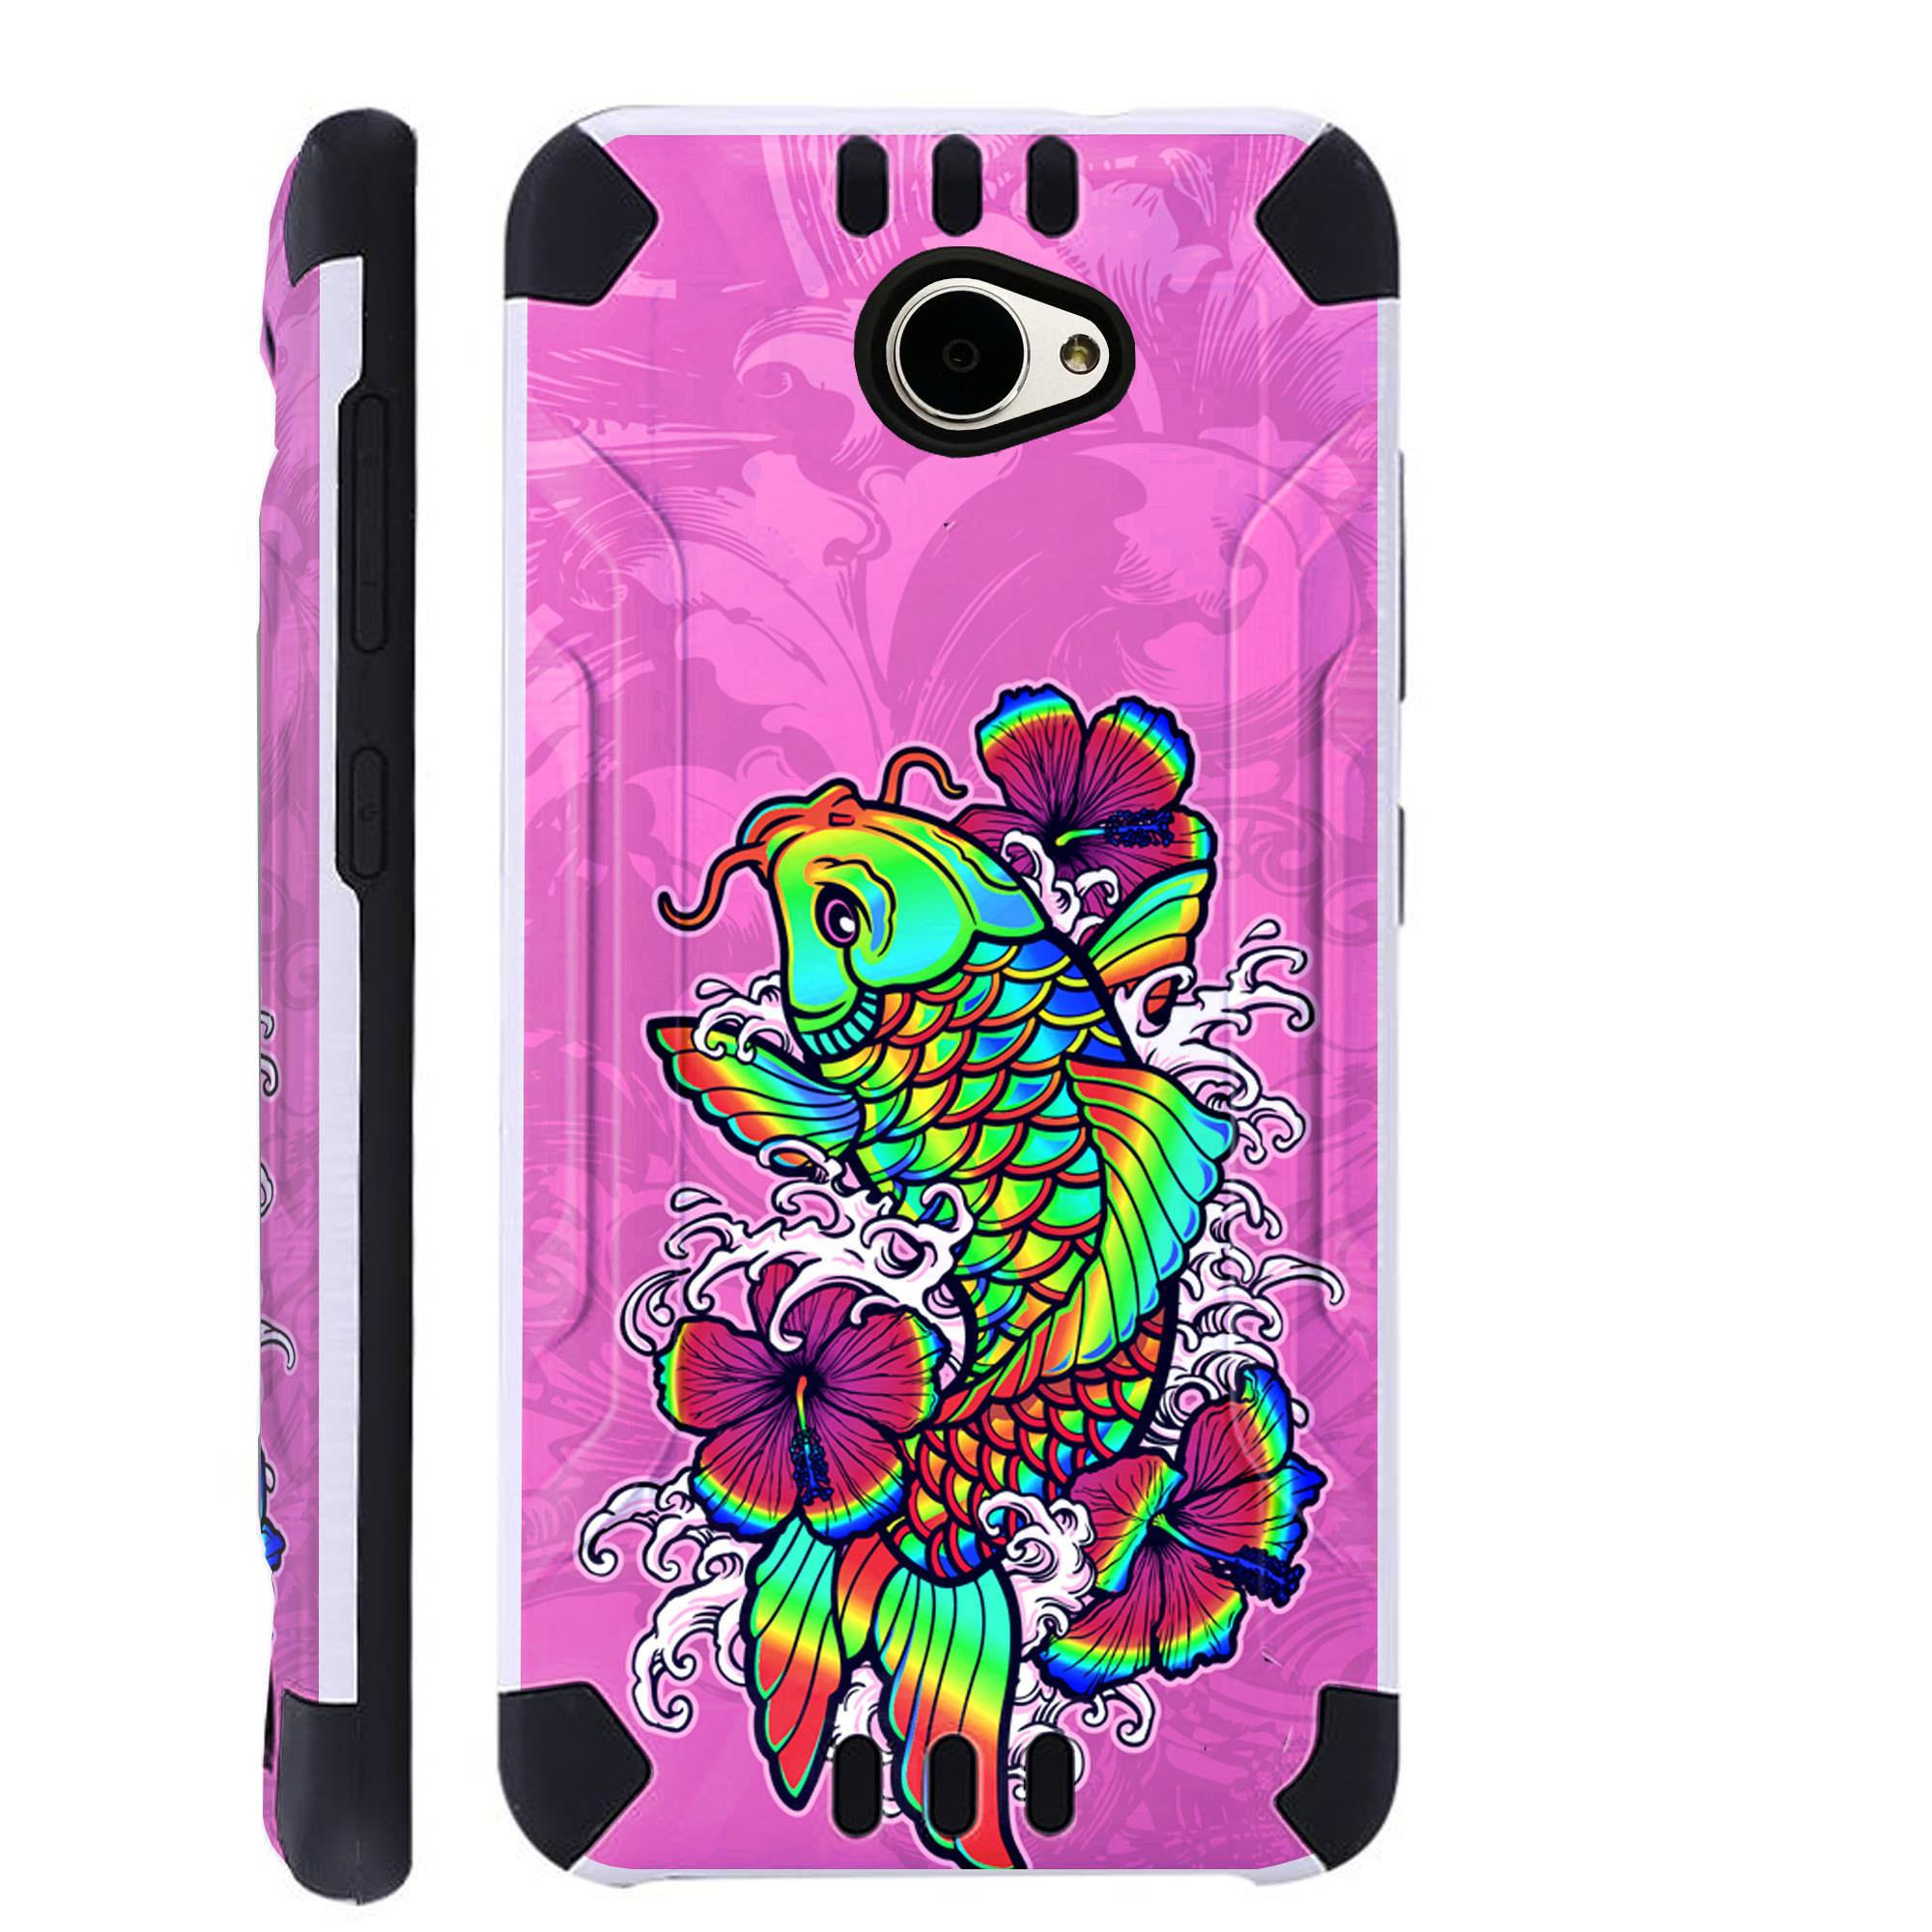 For Huawei Ascend XT2 / Huawei Ascend XT 2 / Huawei Elate 4G Case Brushed Metal Texture Hybrid TPU KombatGuard Phone Cover (Rainbow Koi Fish)